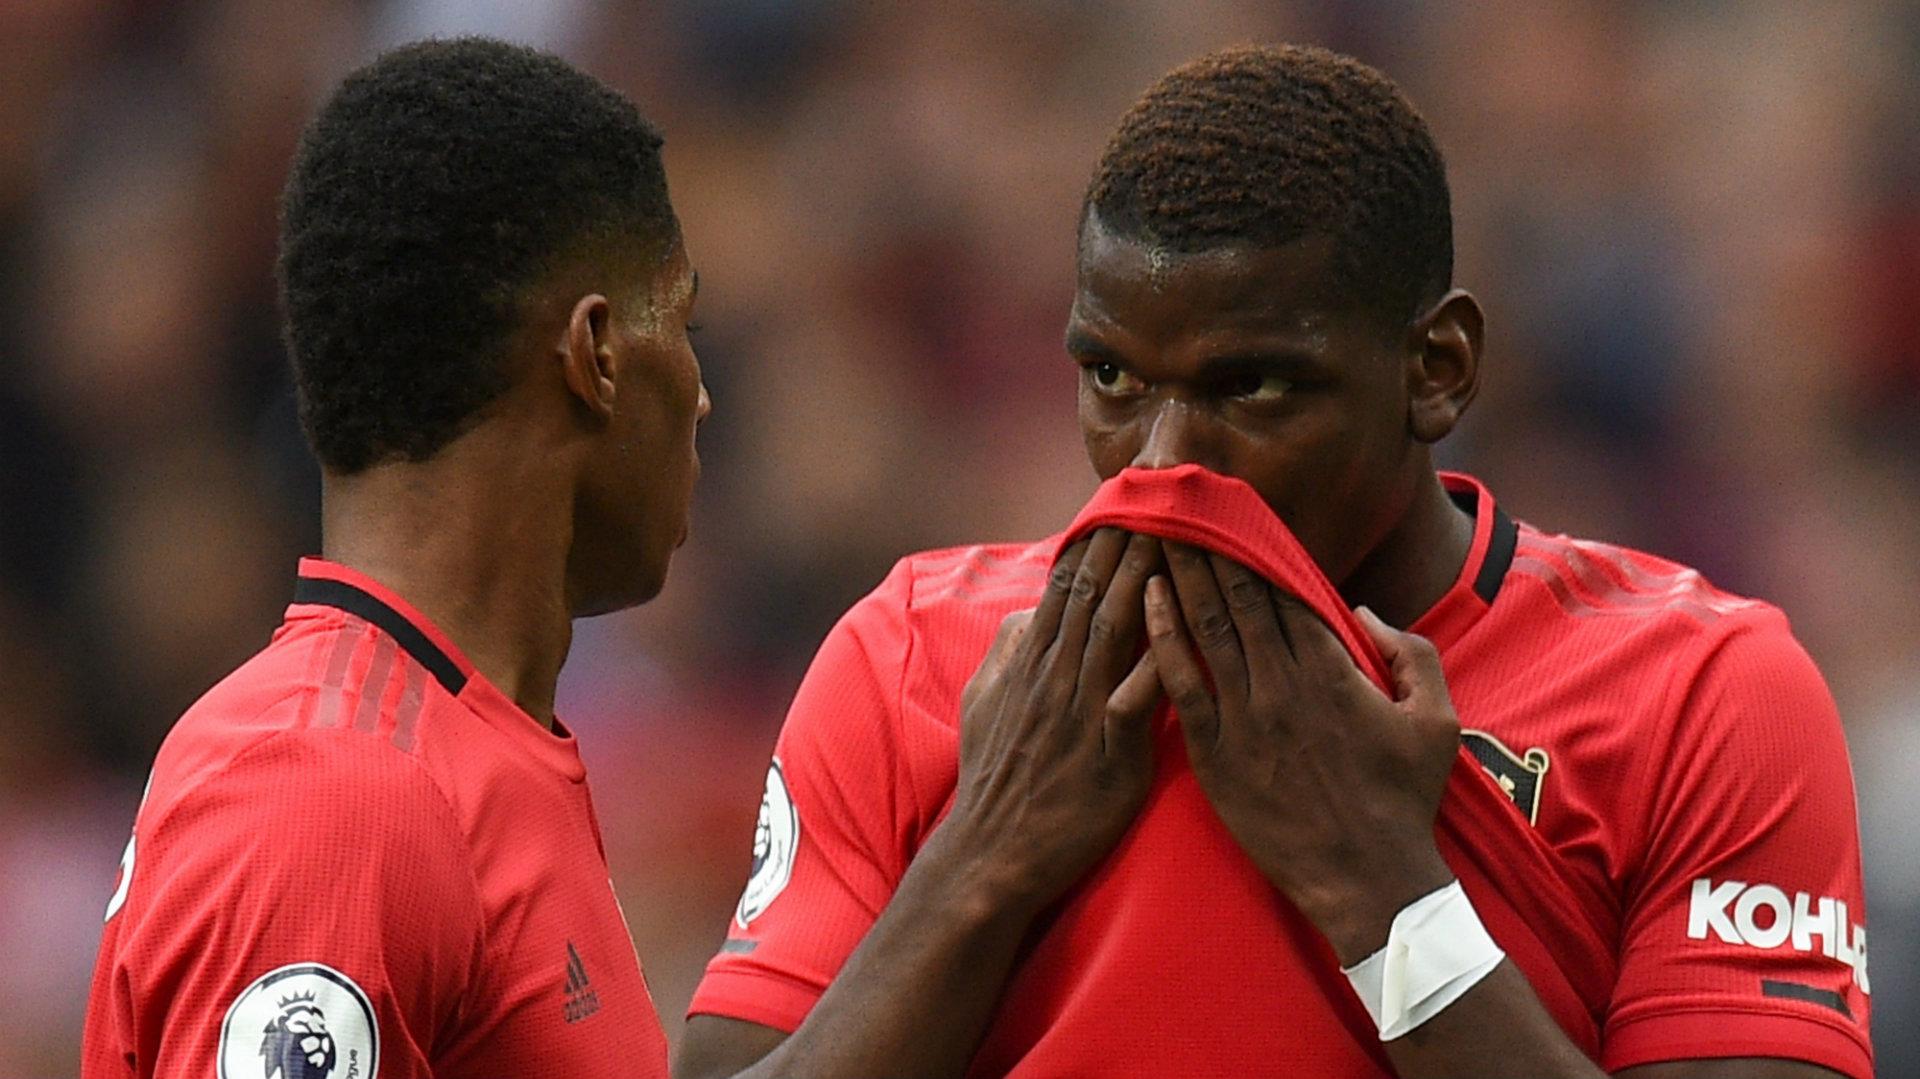 Pogba & Rashford 'looking good' for Man Utd as Solskjaer waits on Premier League green light